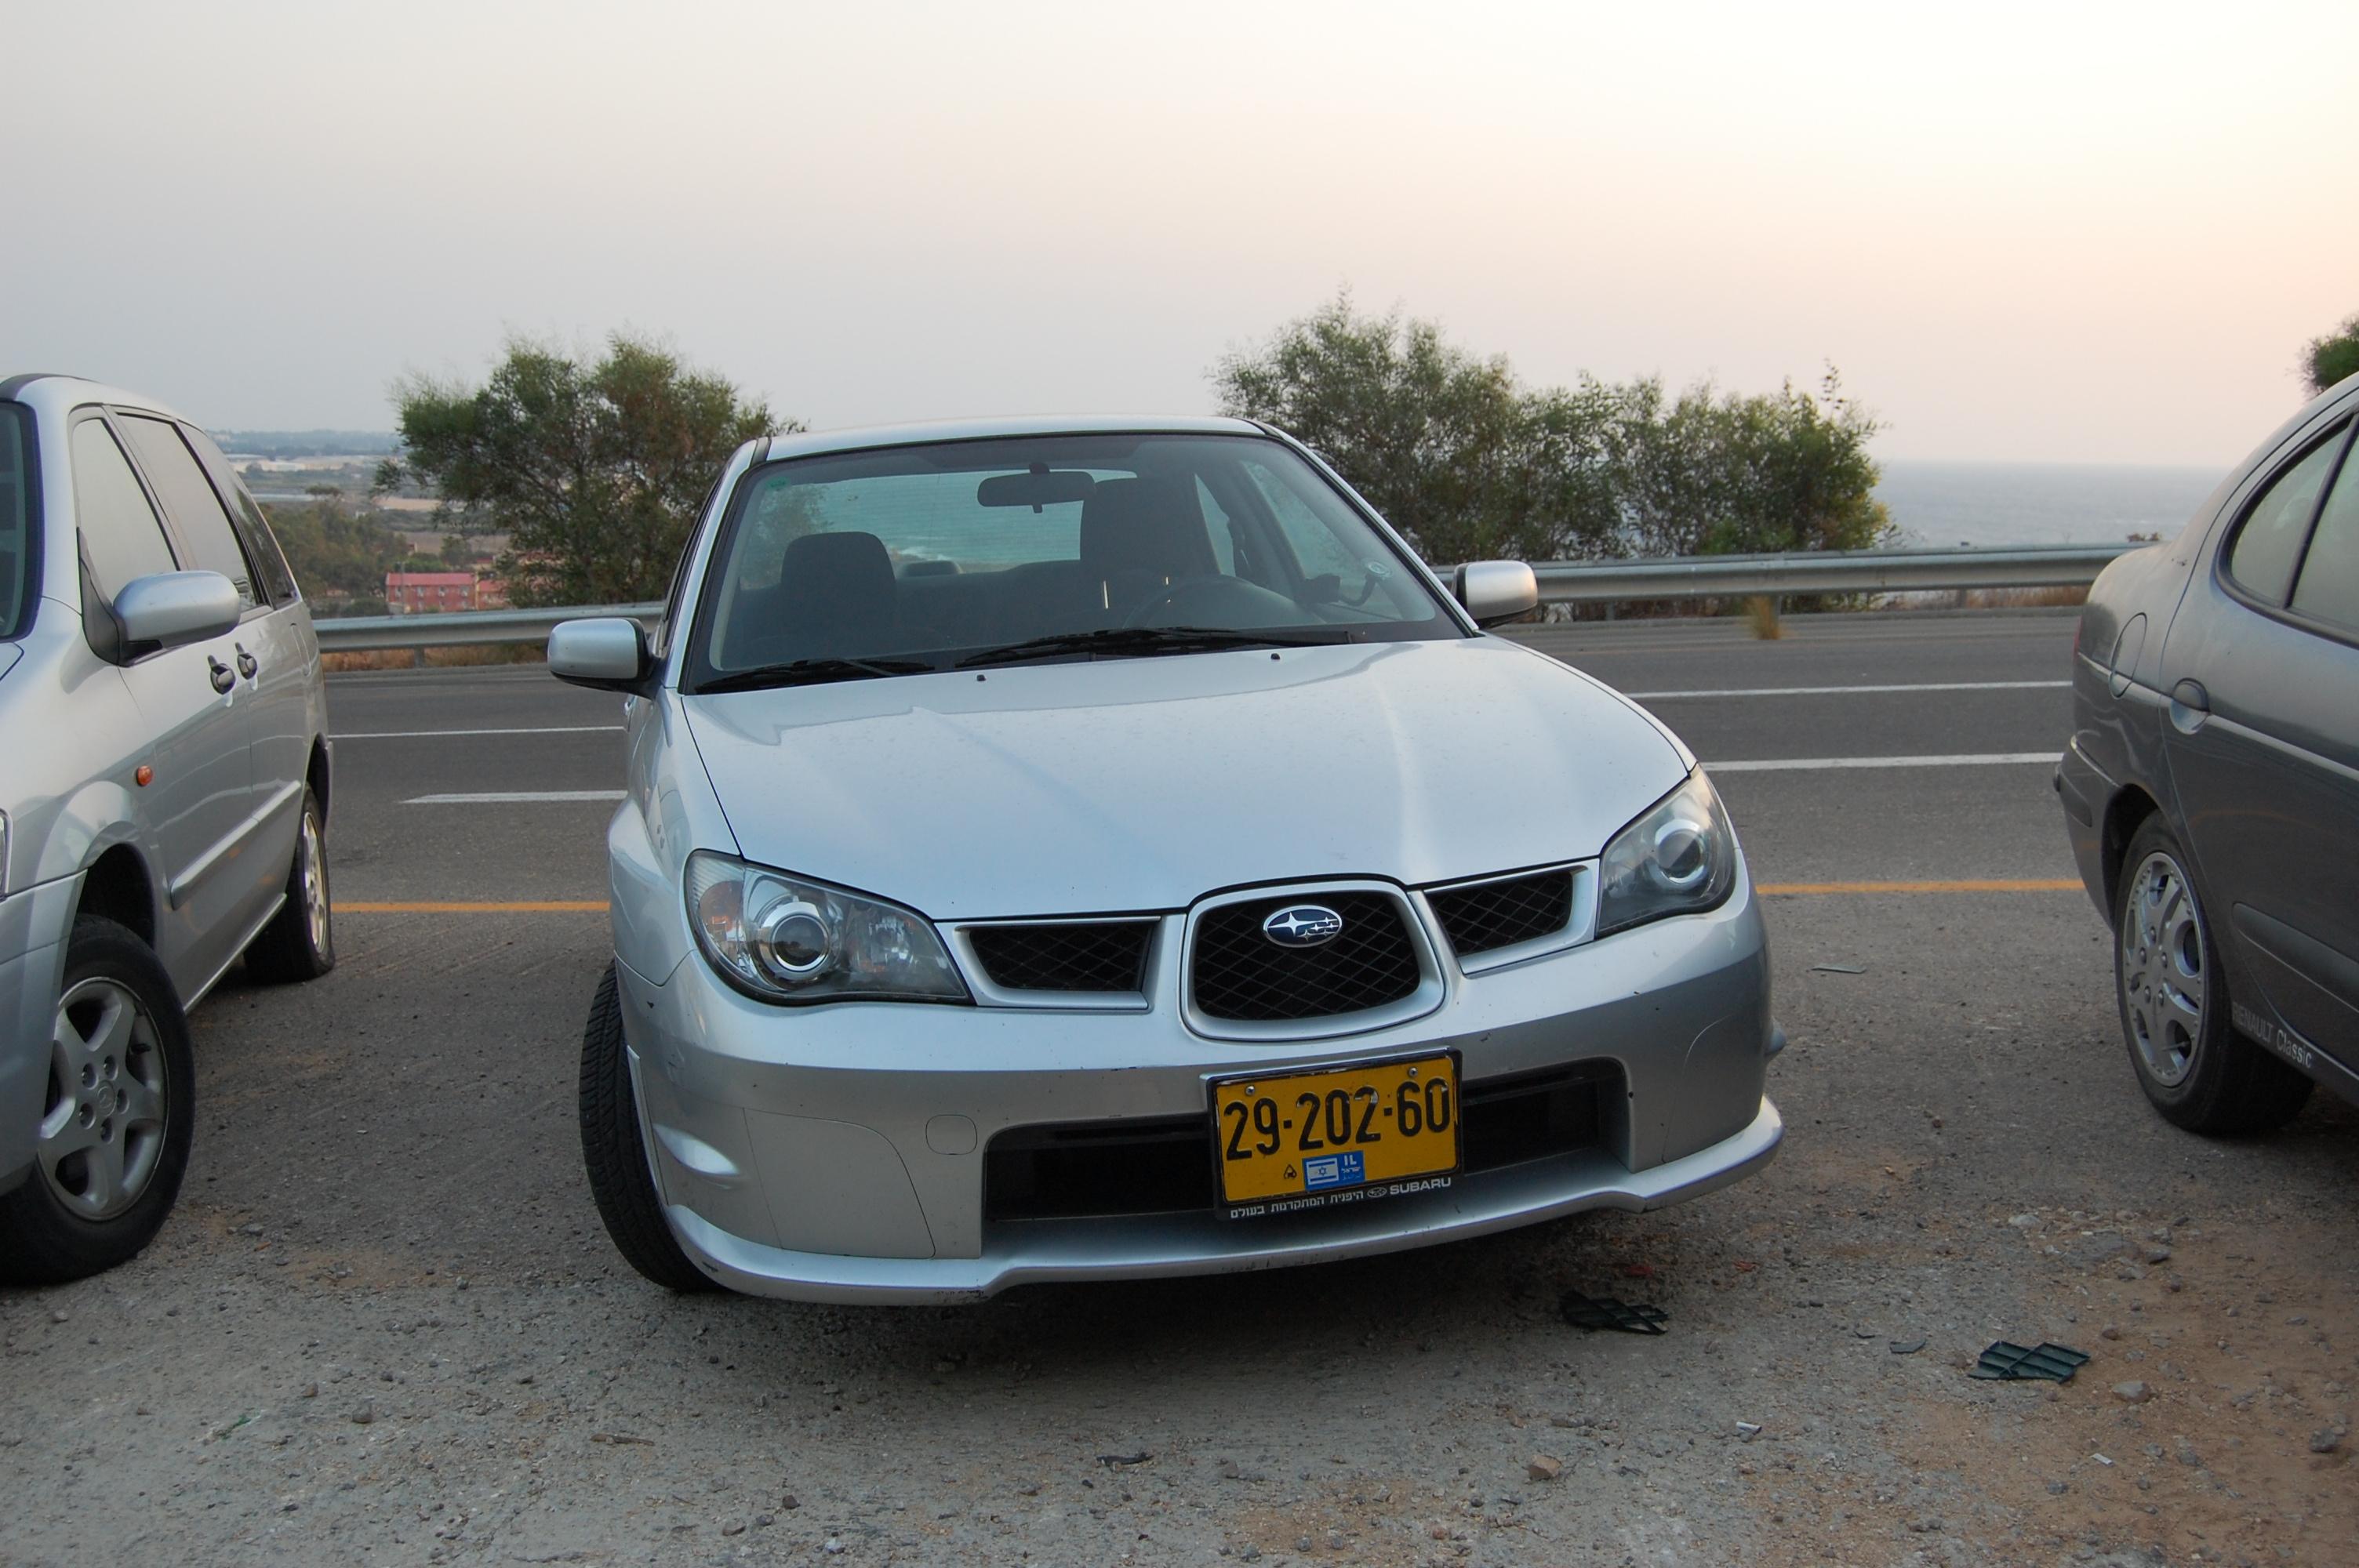 2007 Subaru Imprezza 1.6